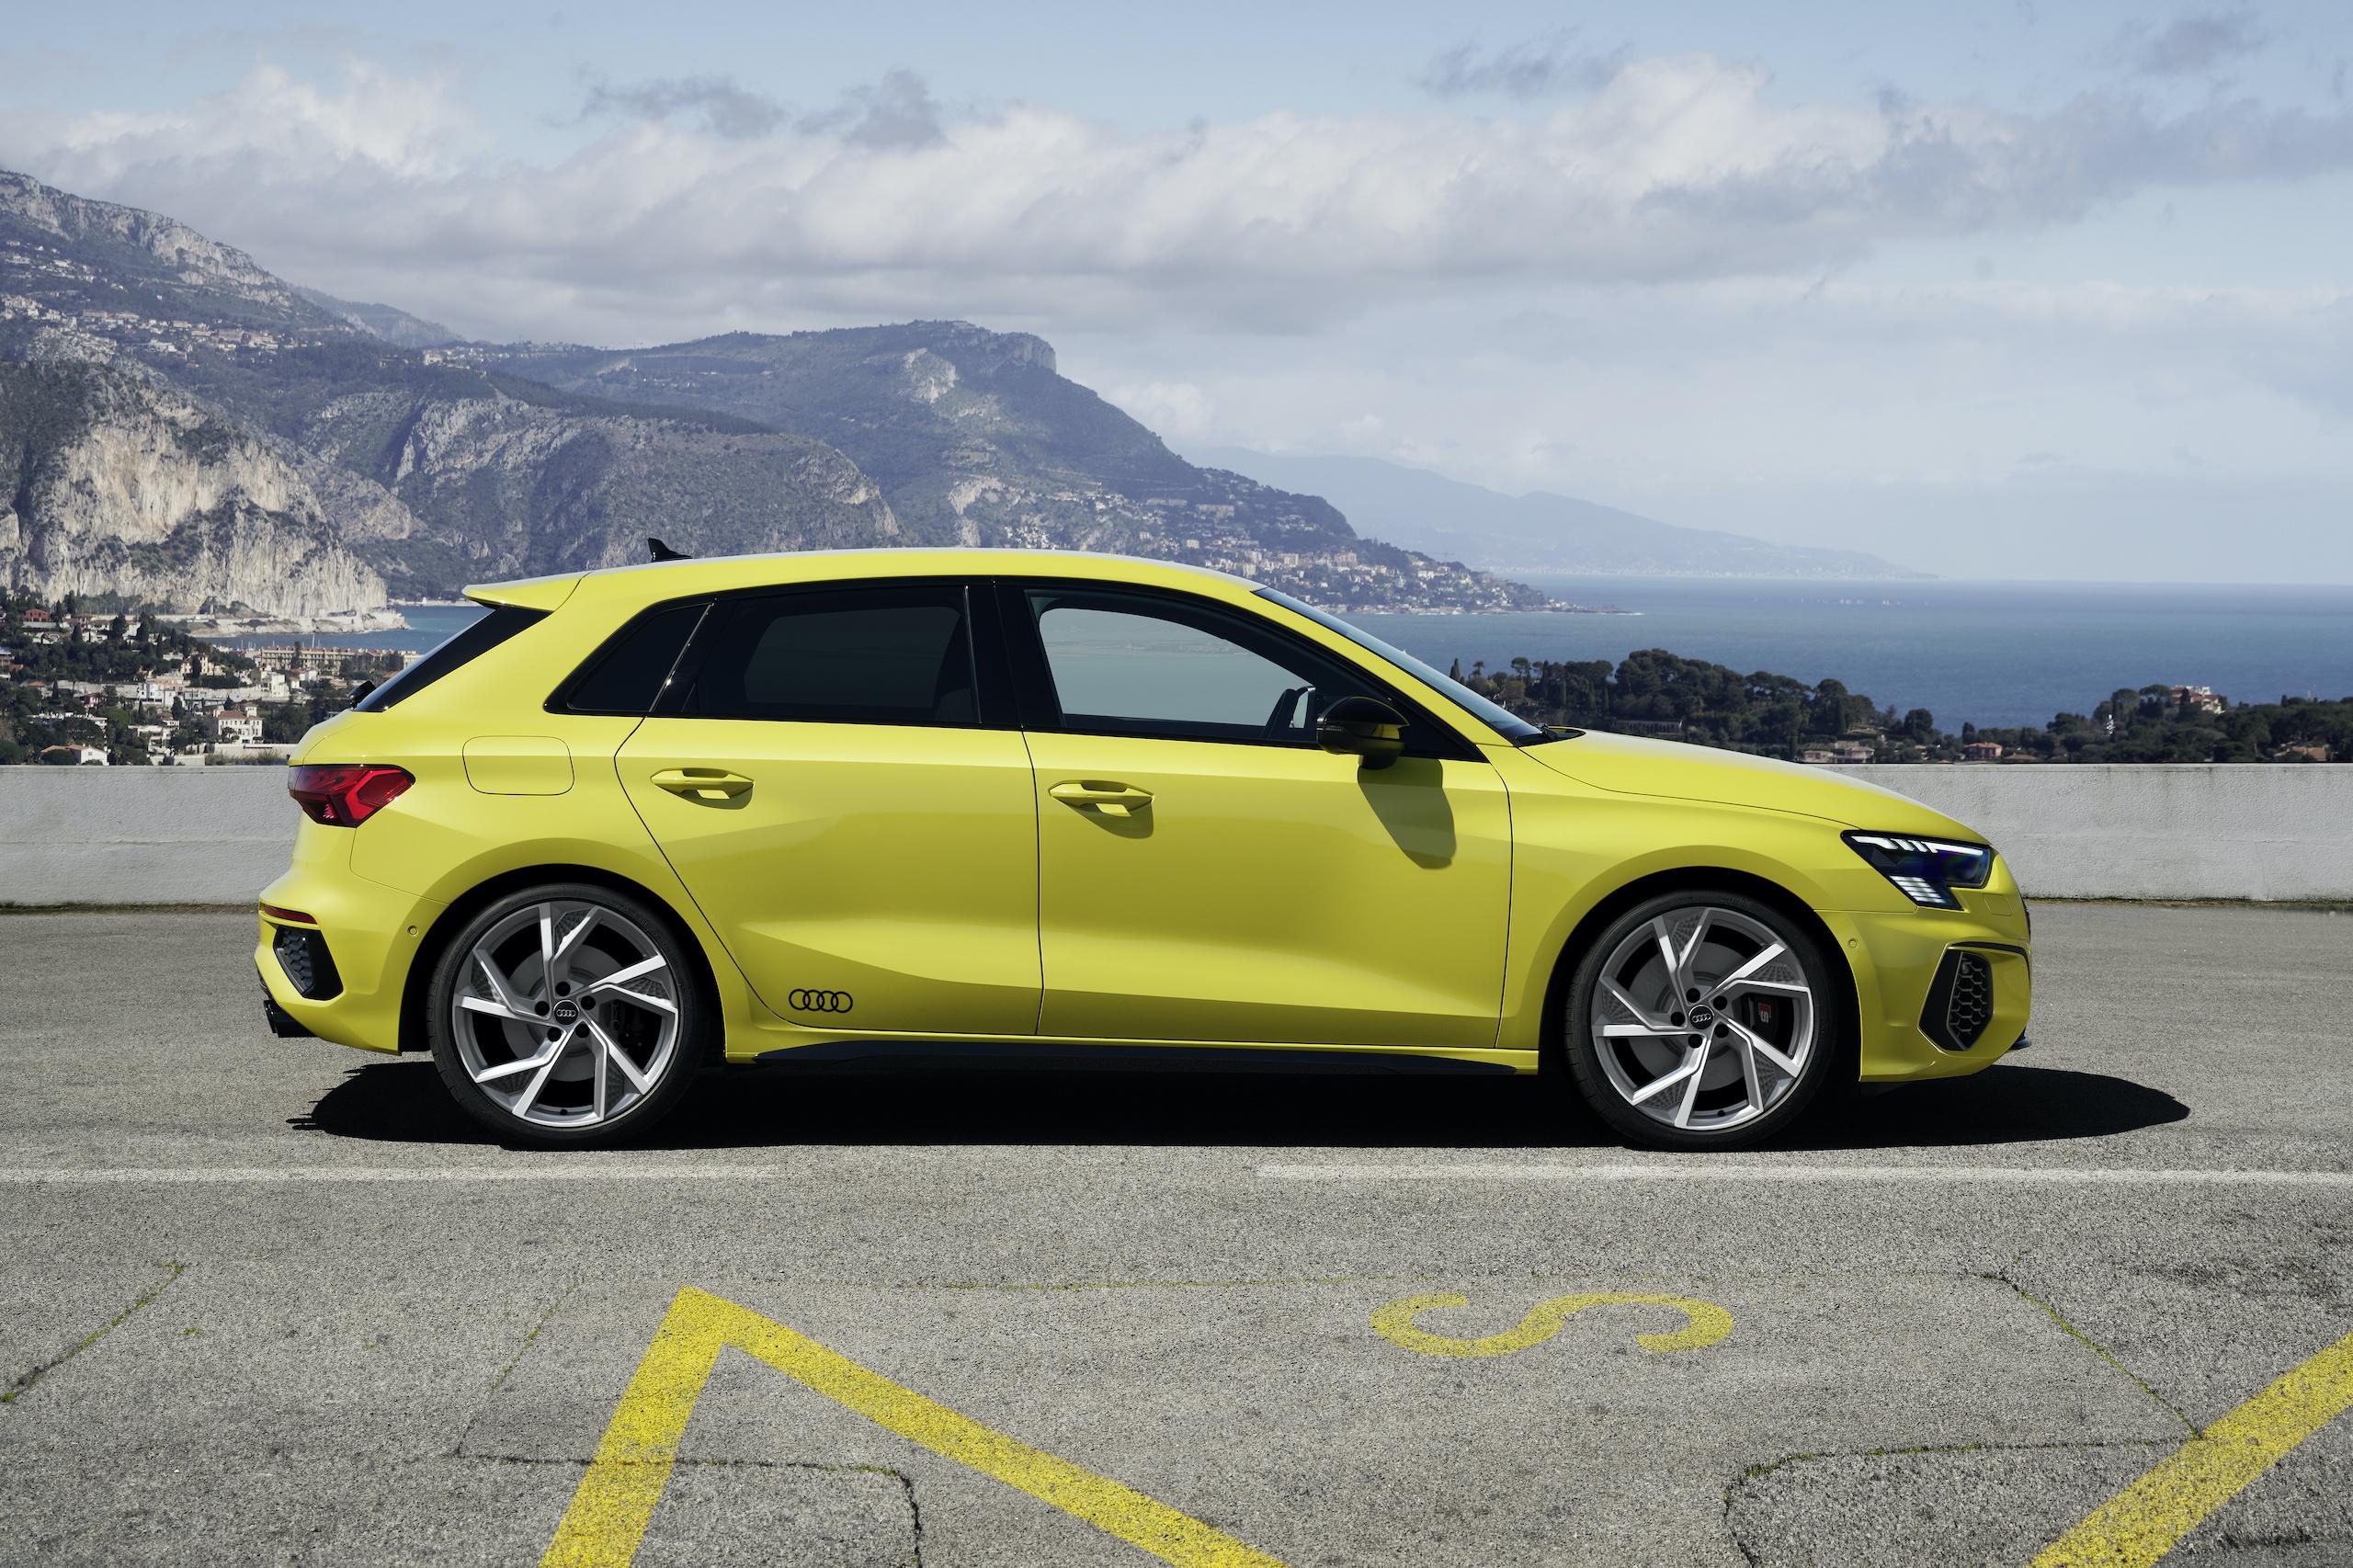 Audi S3 Sportback python yellow